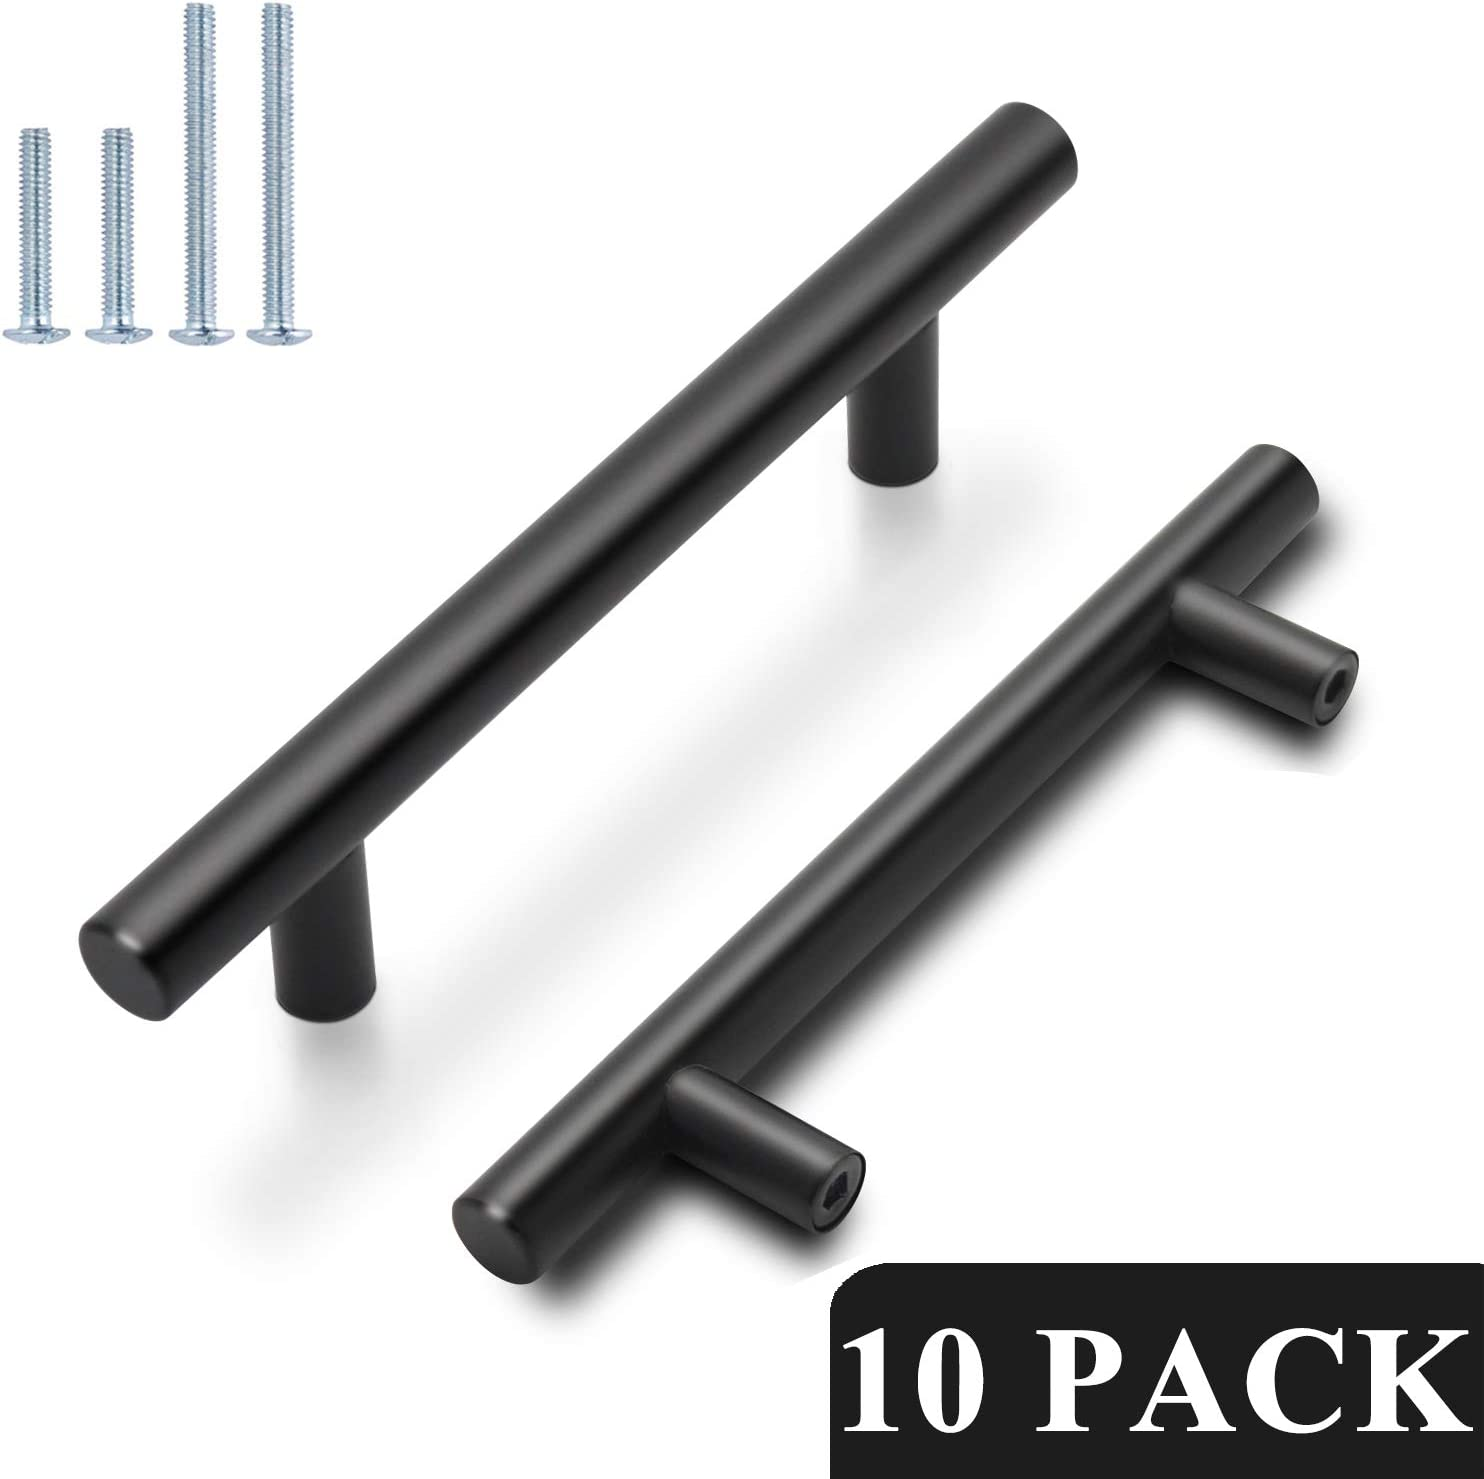 10 inch Hole Spacing Probrico Flat Black Modern Cupboard Pull Bedroom T Bar Handle Dresser Knobs Set Kitchen Cabinet Hardware